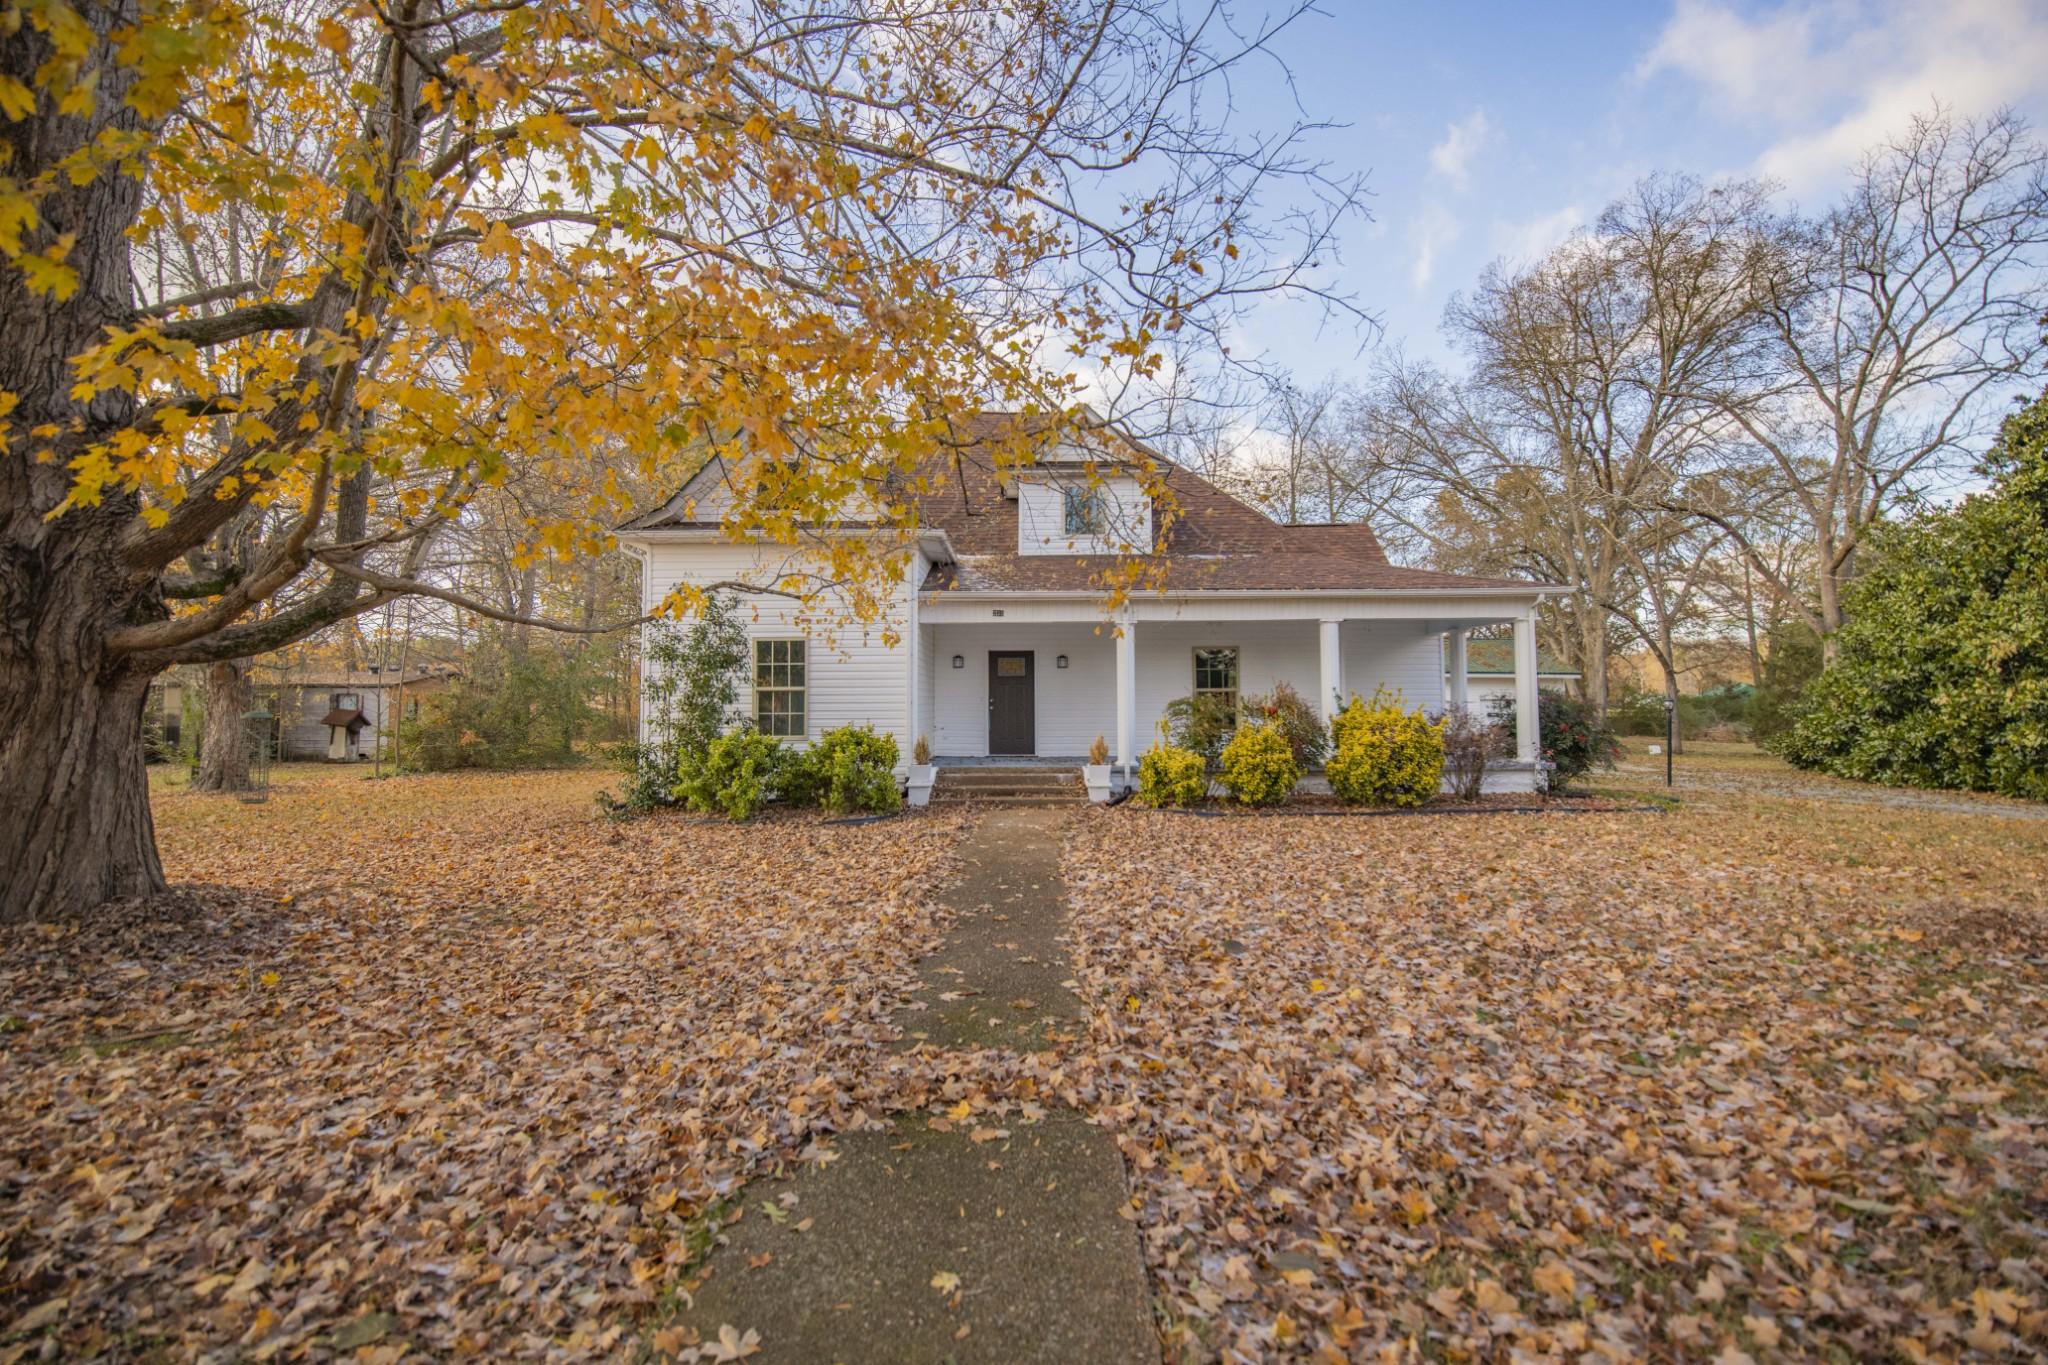 231 W Maple St, Morrison, TN 37357 - Morrison, TN real estate listing